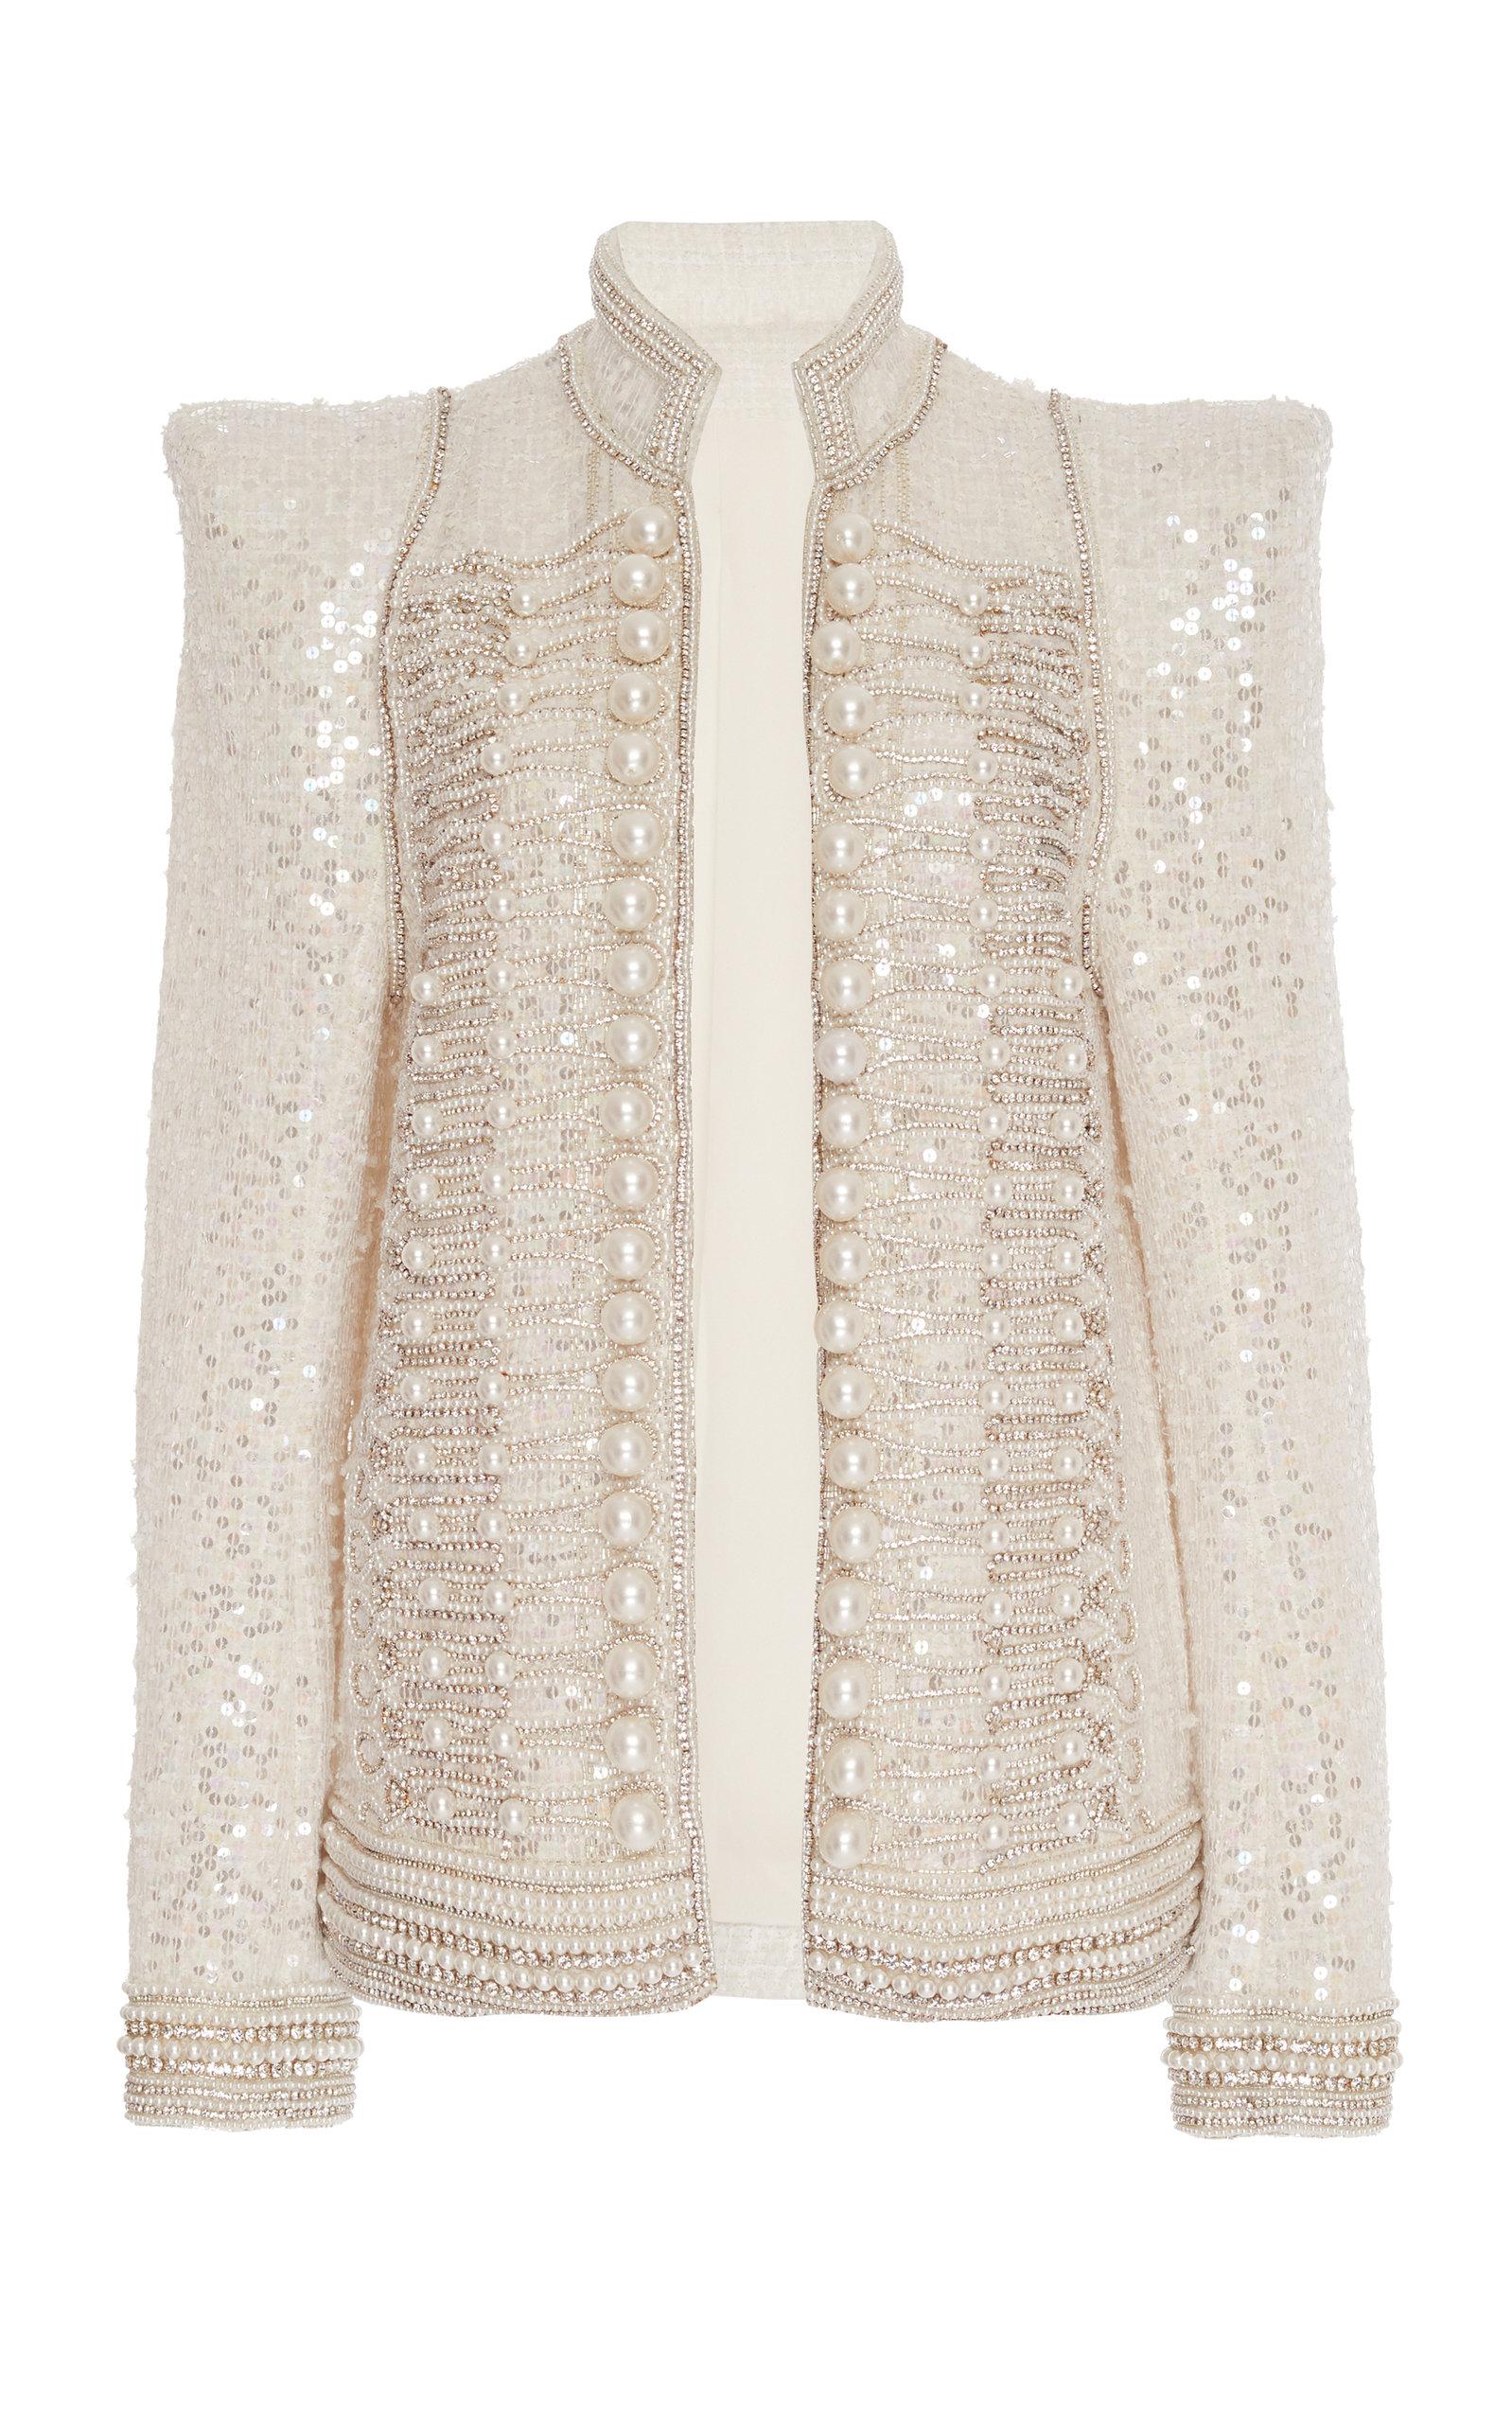 21495e22 Pearl Embroidered Sequin Jacket by Balmain | Moda Operandi